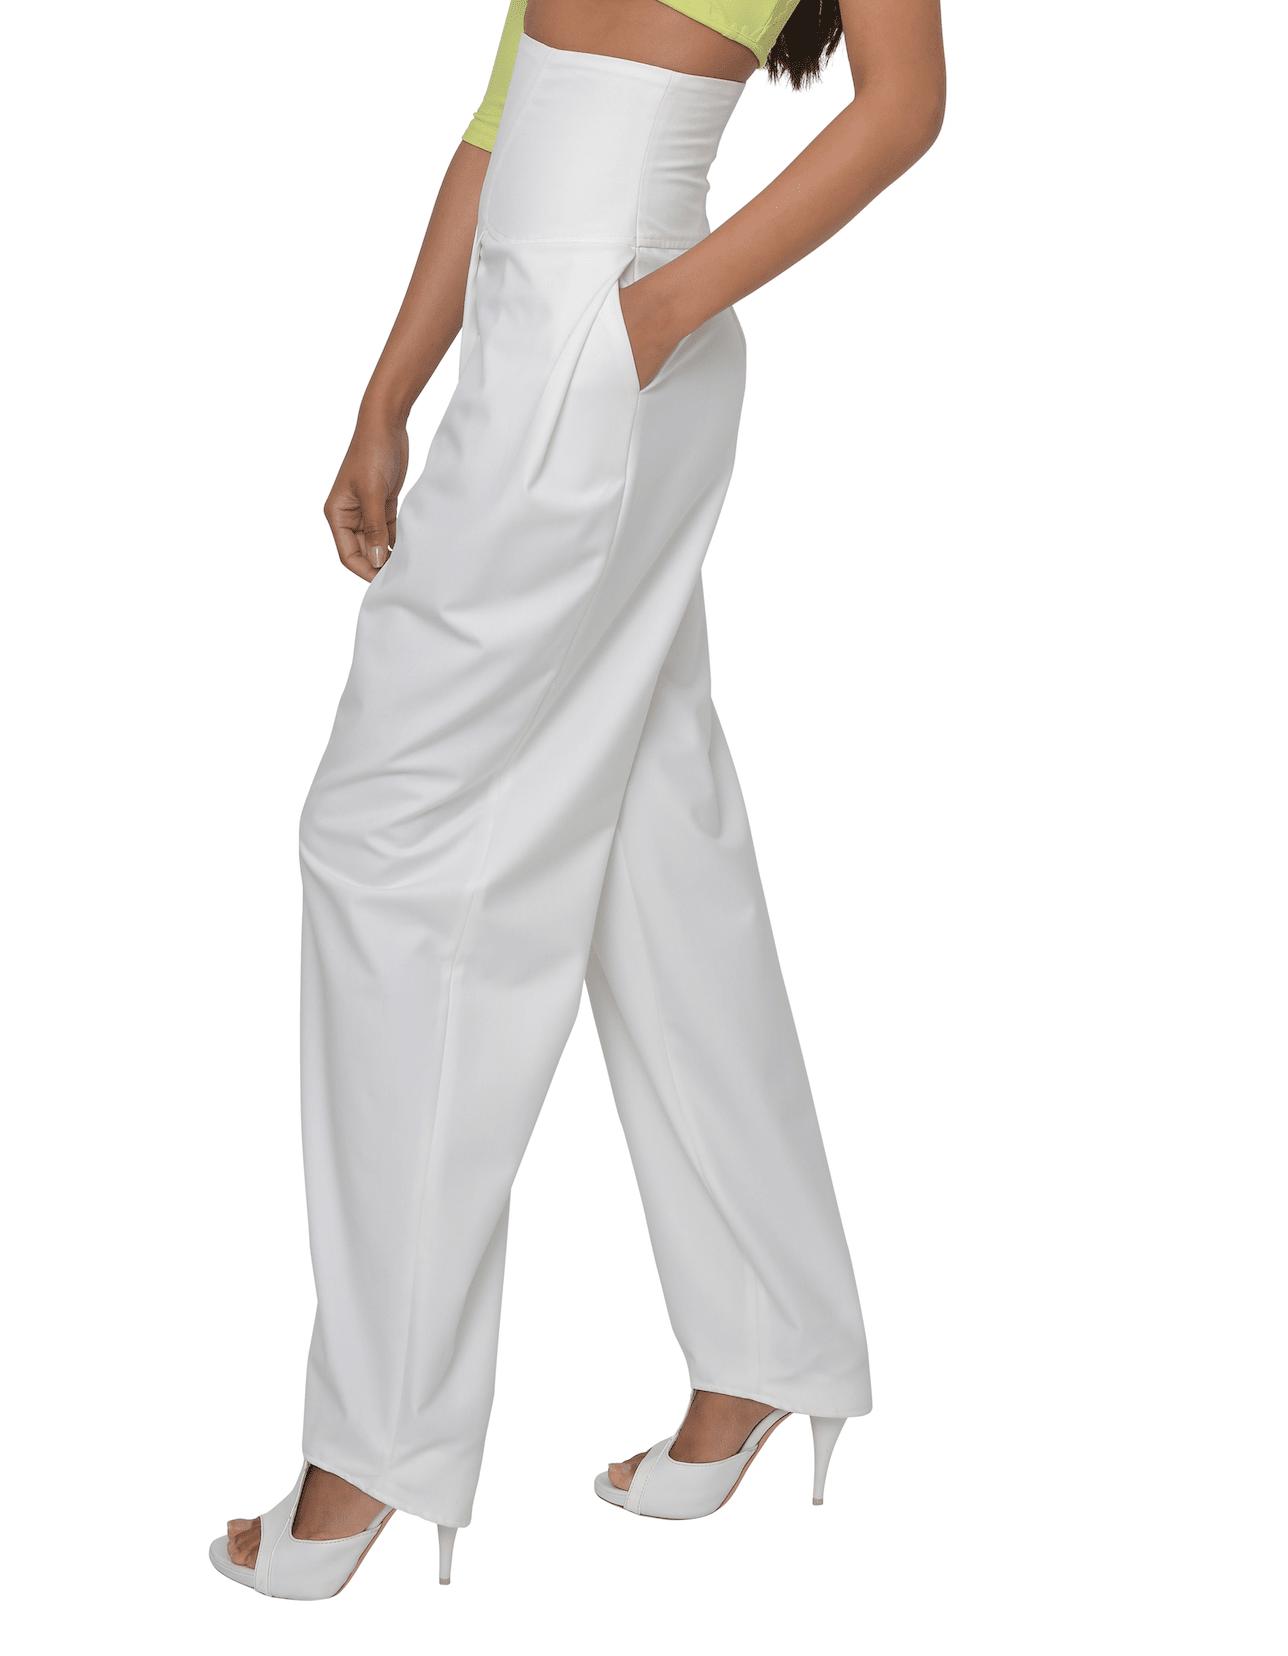 Trousers CLÍVIA I 3